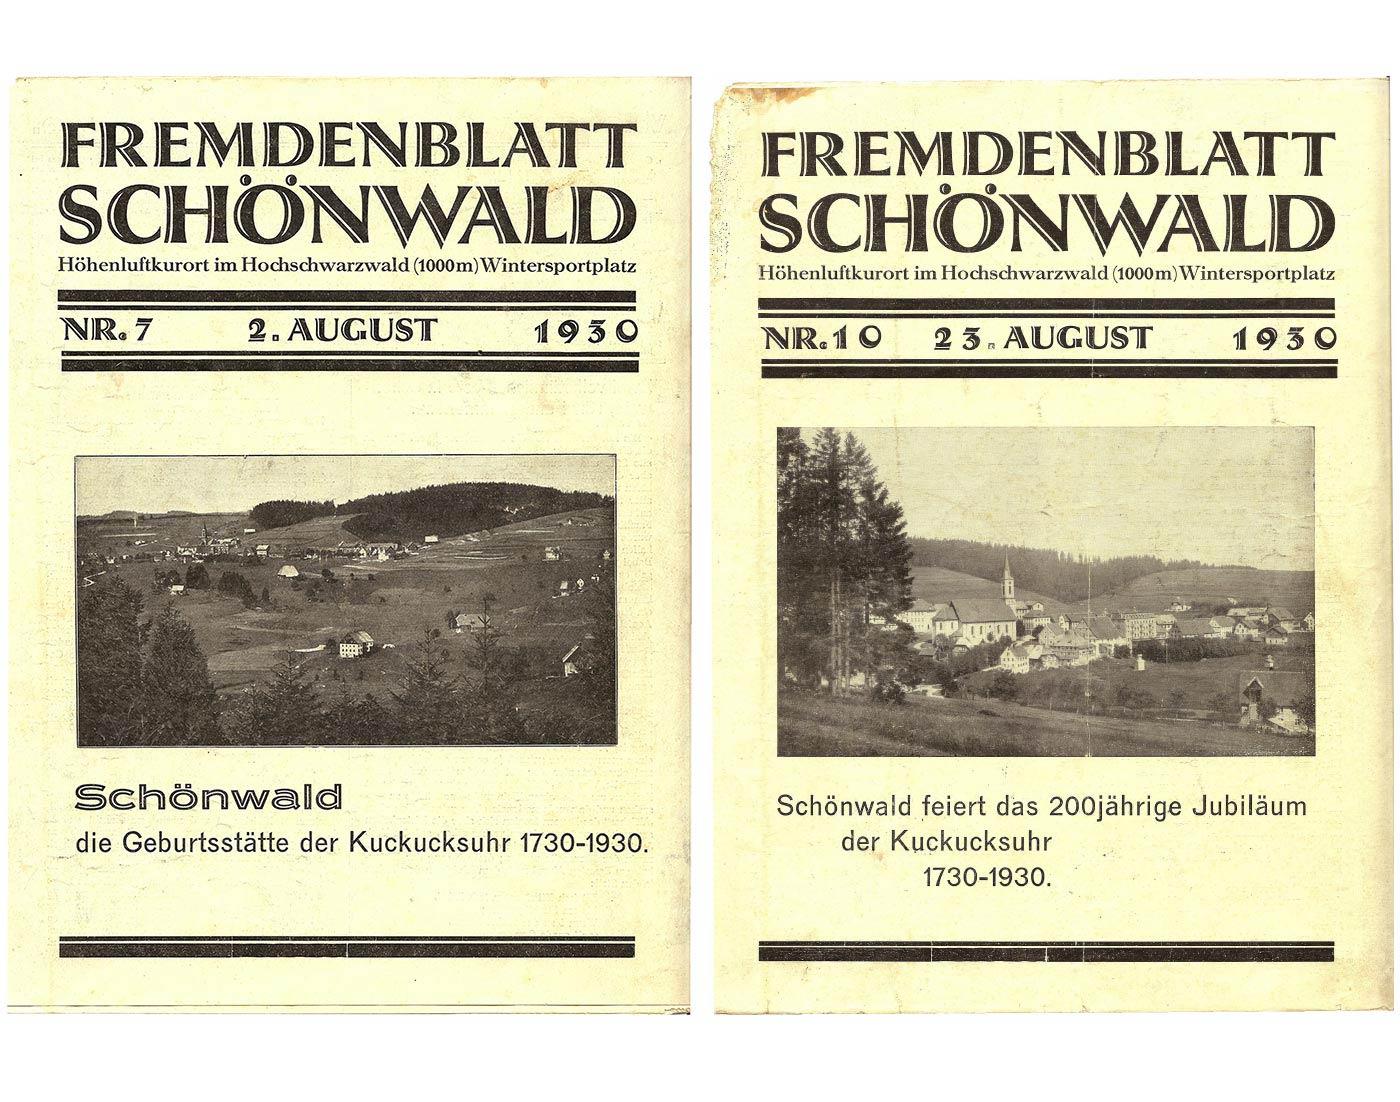 Fremdenblatt Schönwald